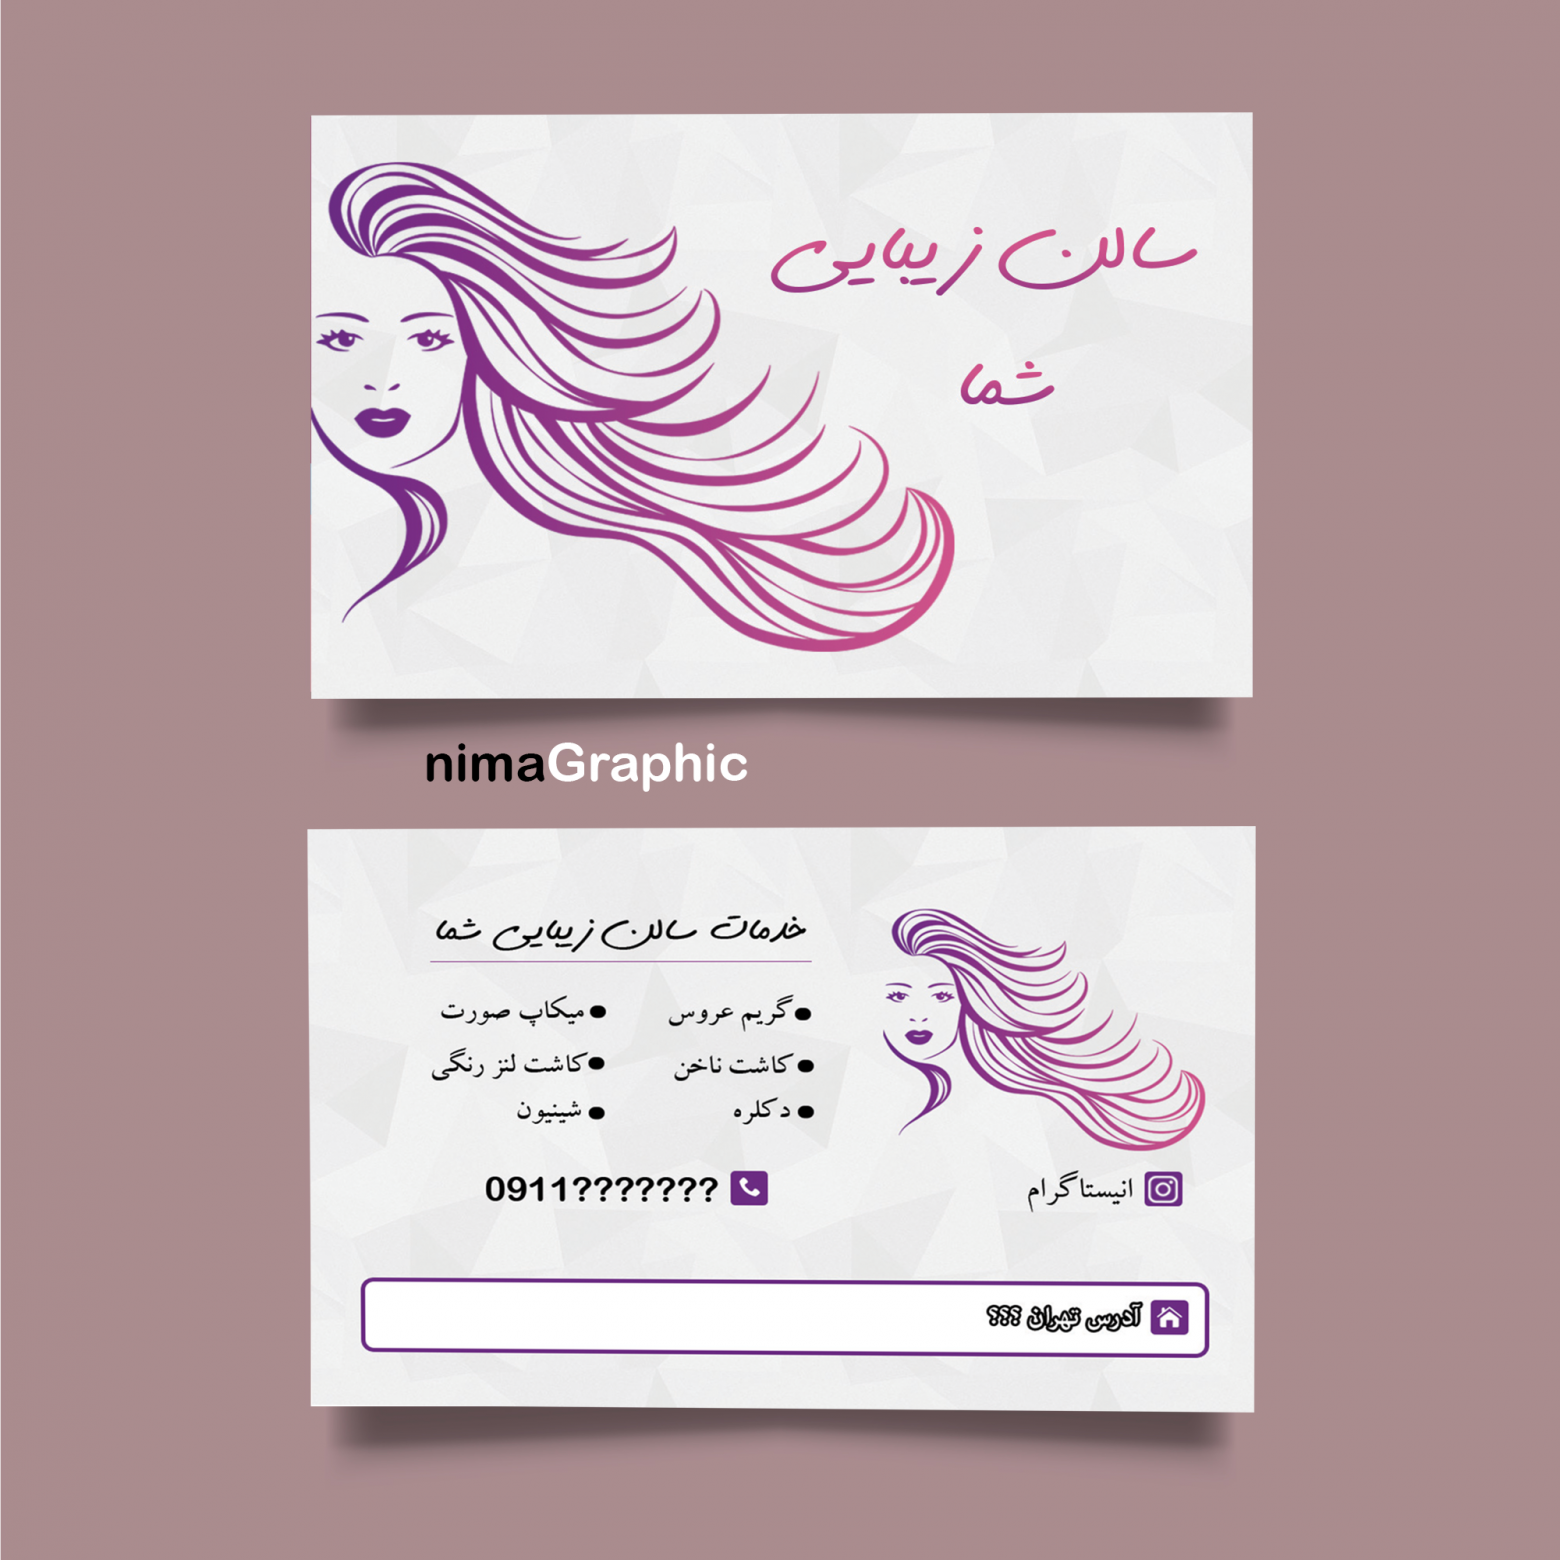 3259490 1560x1560 - کارت ویزیت لایه باز سالن زیبایی و آریشی